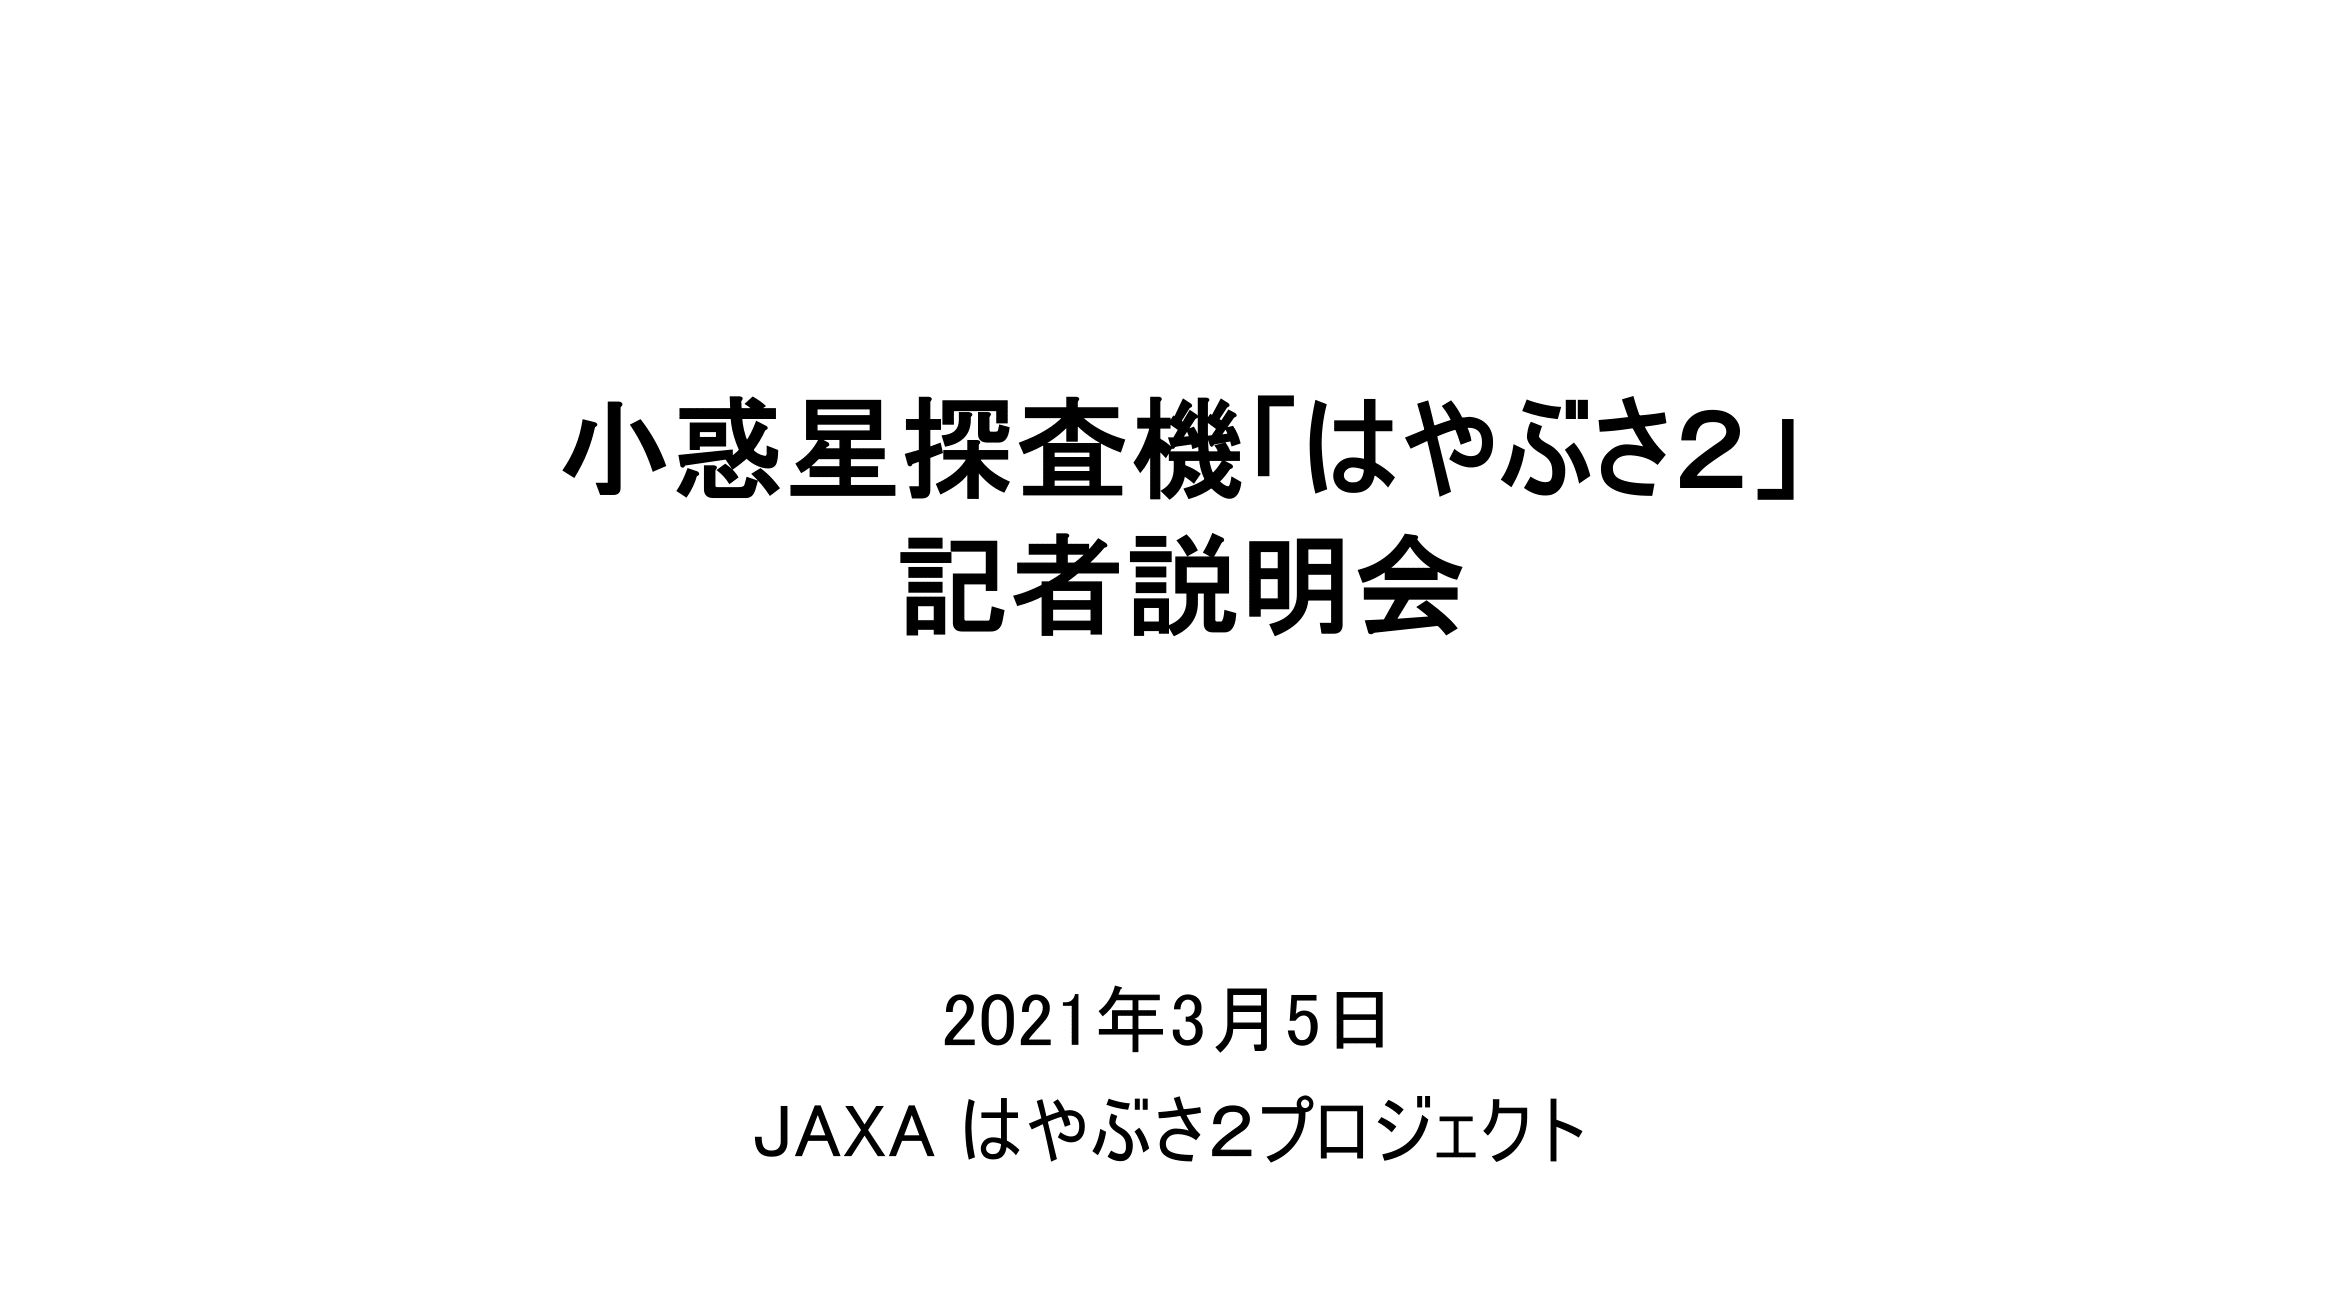 f:id:Imamura:20210305133955p:plain